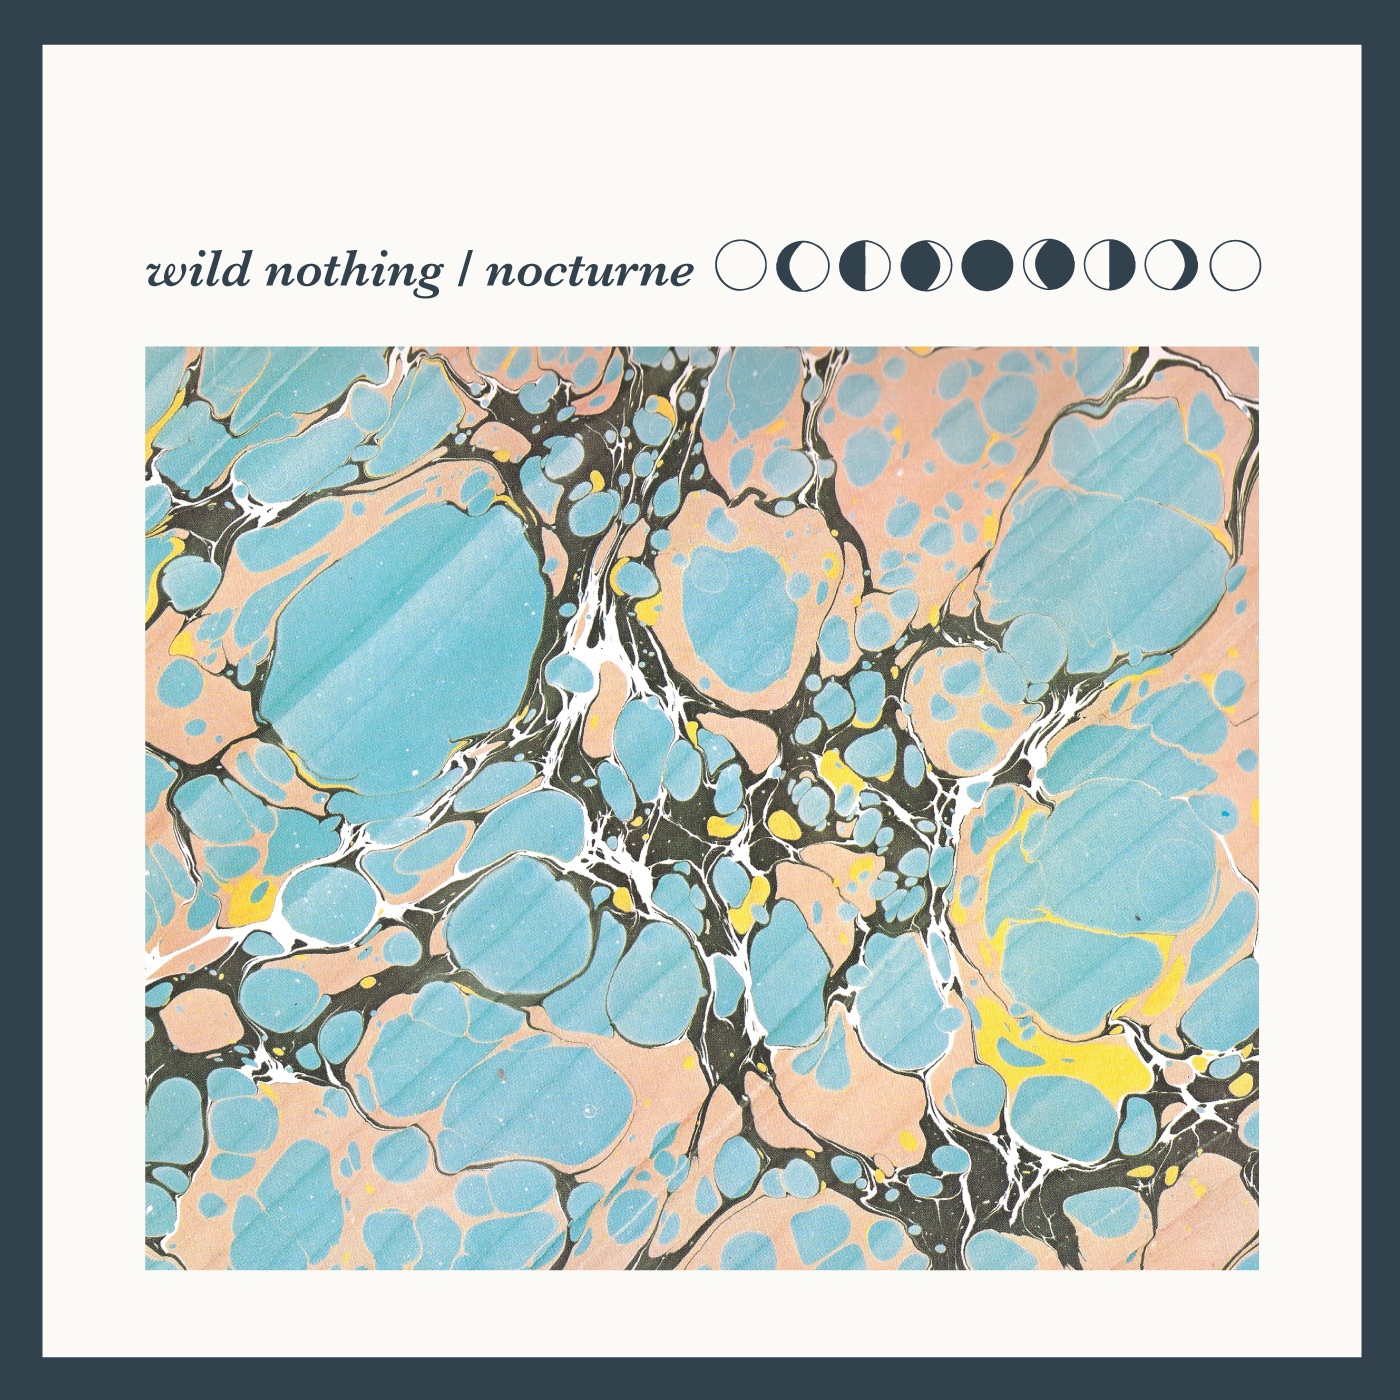 wild nothing nocturne